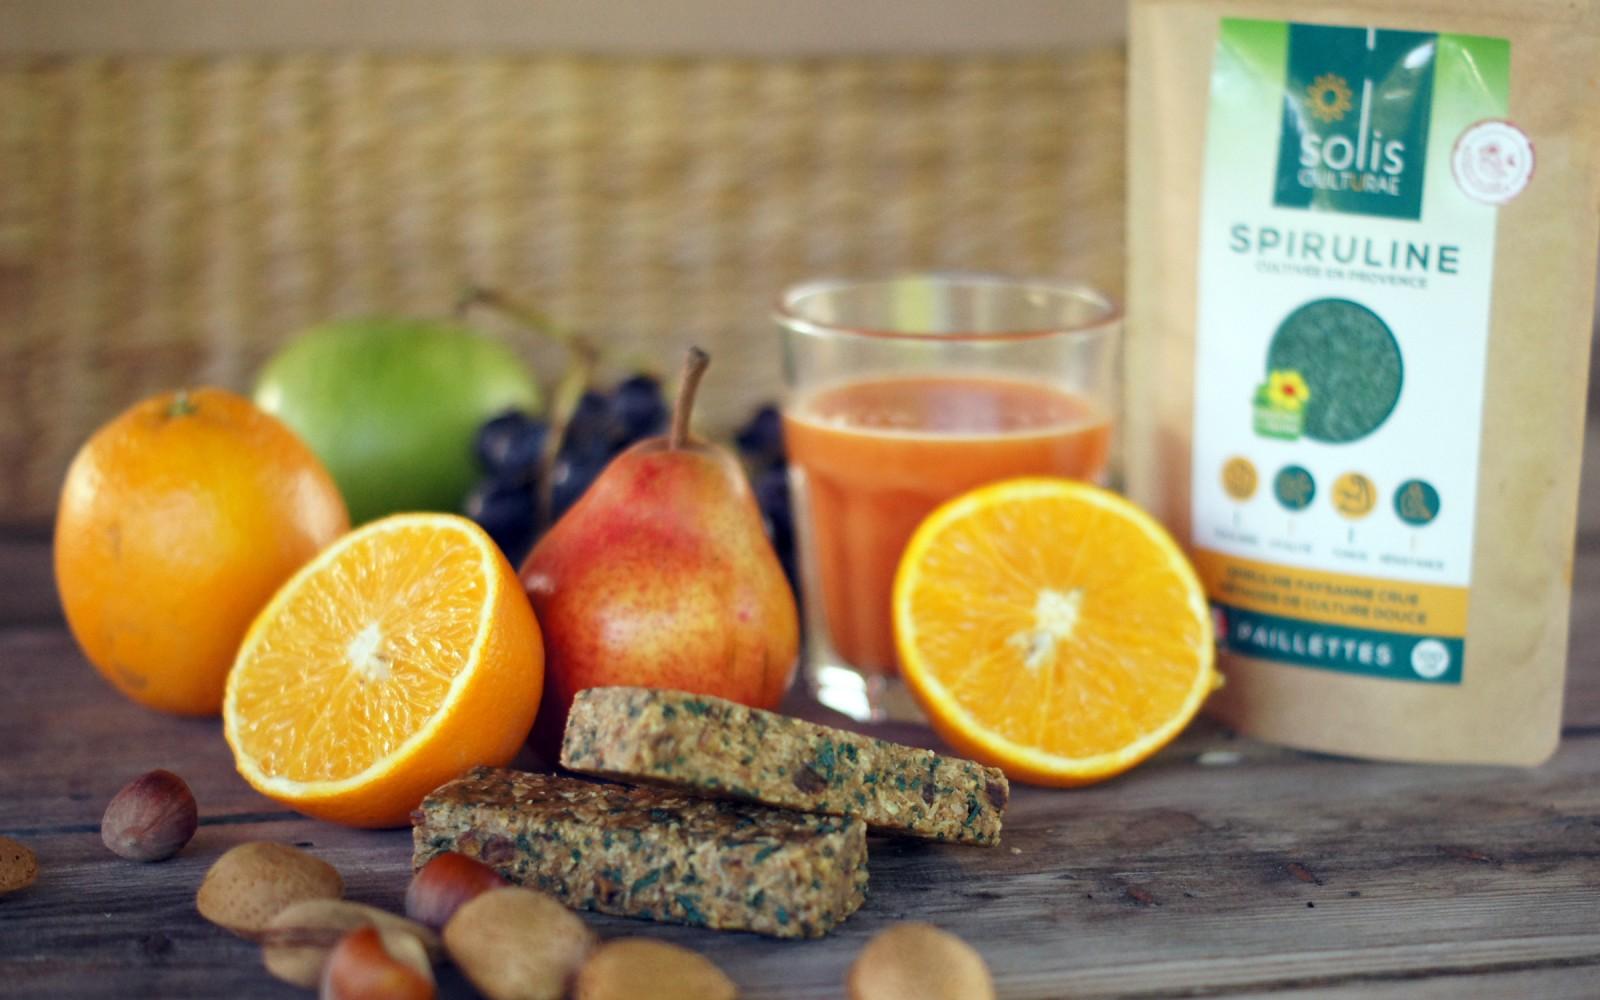 Spiruline Solis Culturae, matin d'automne vitaminé